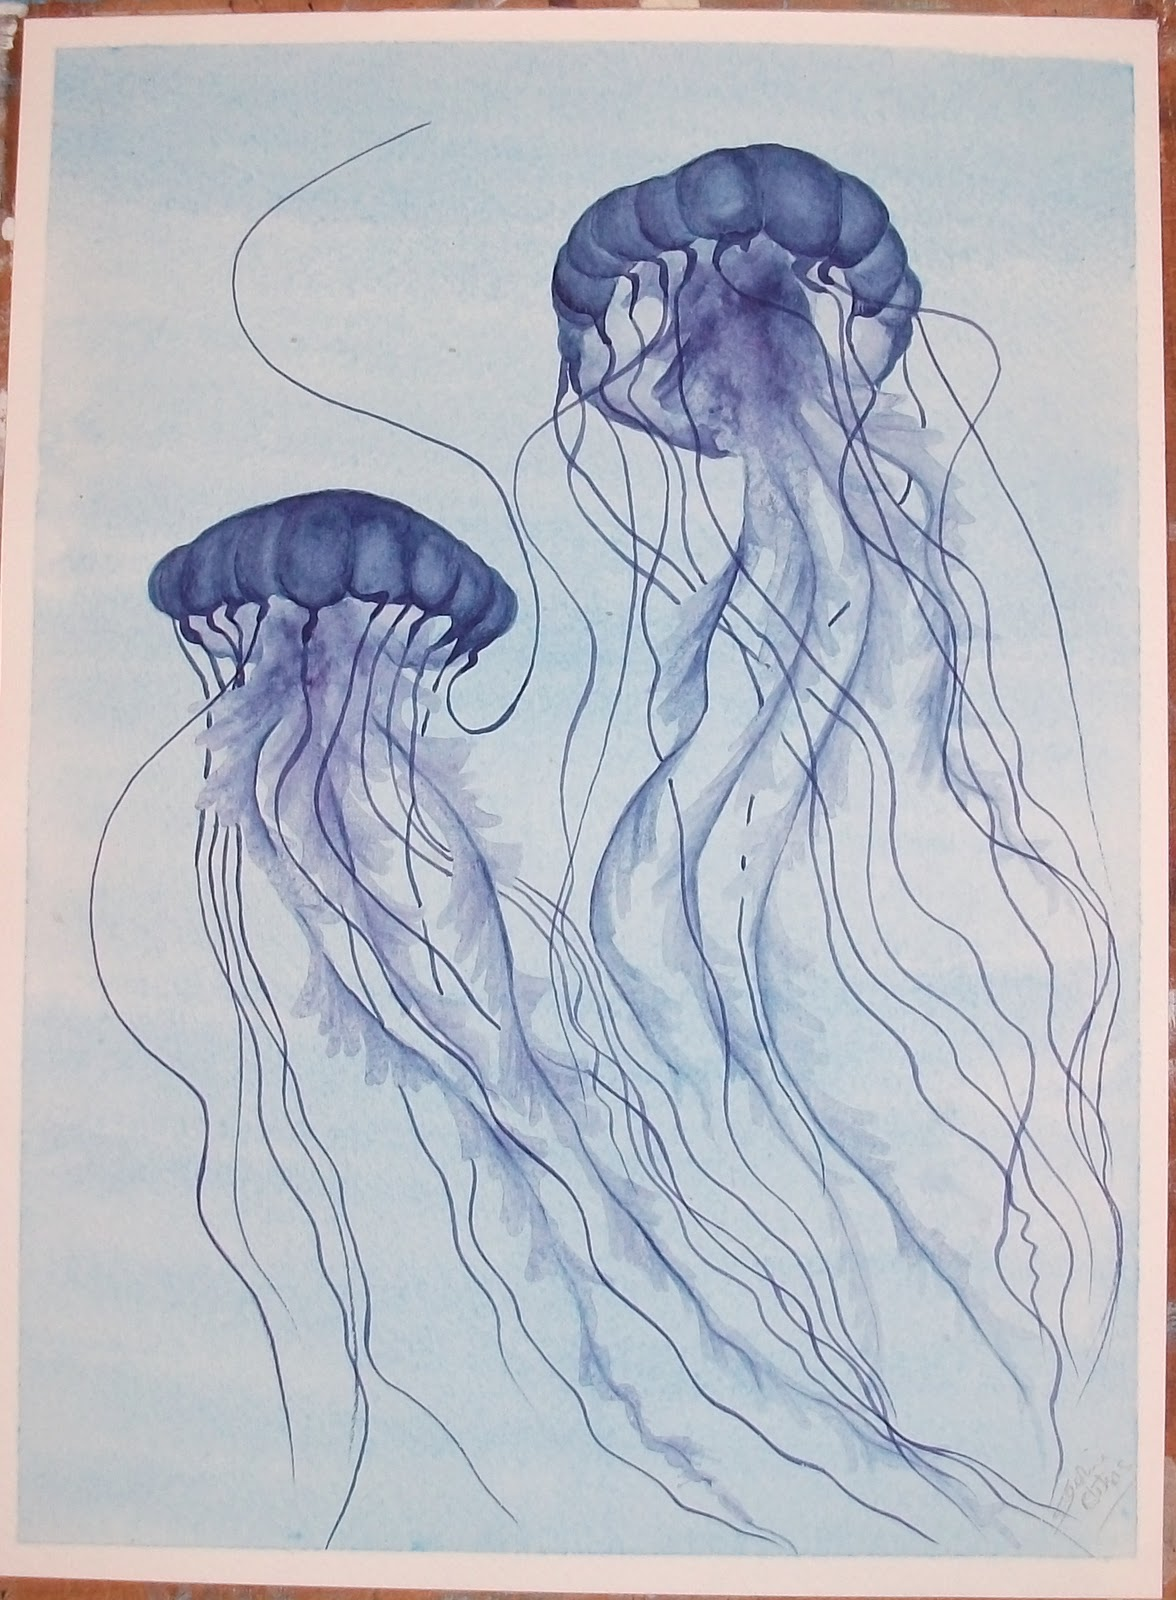 Uniqart: Blue Jellyfish No.9